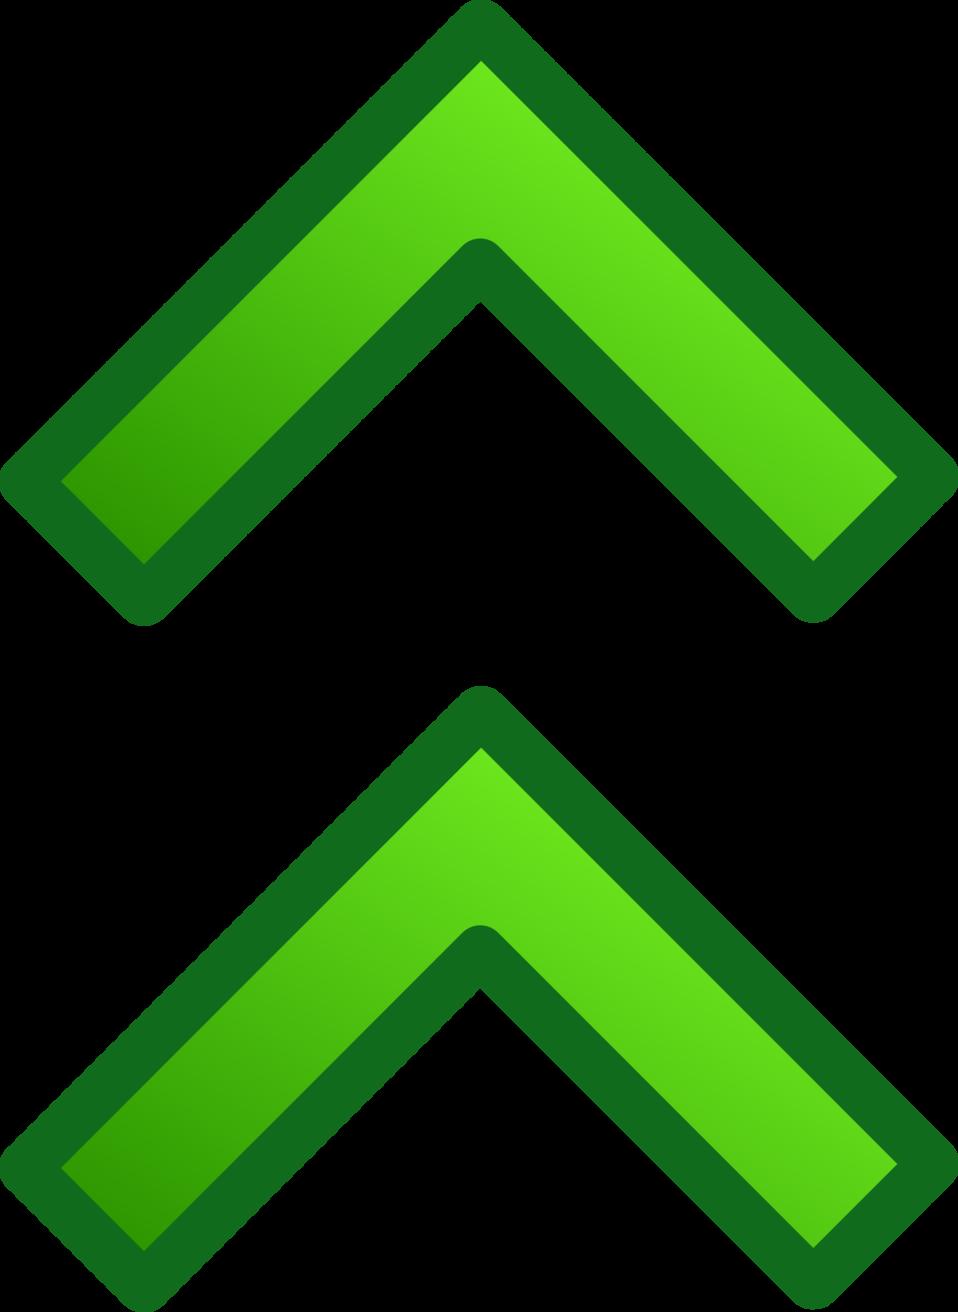 green double arrows set